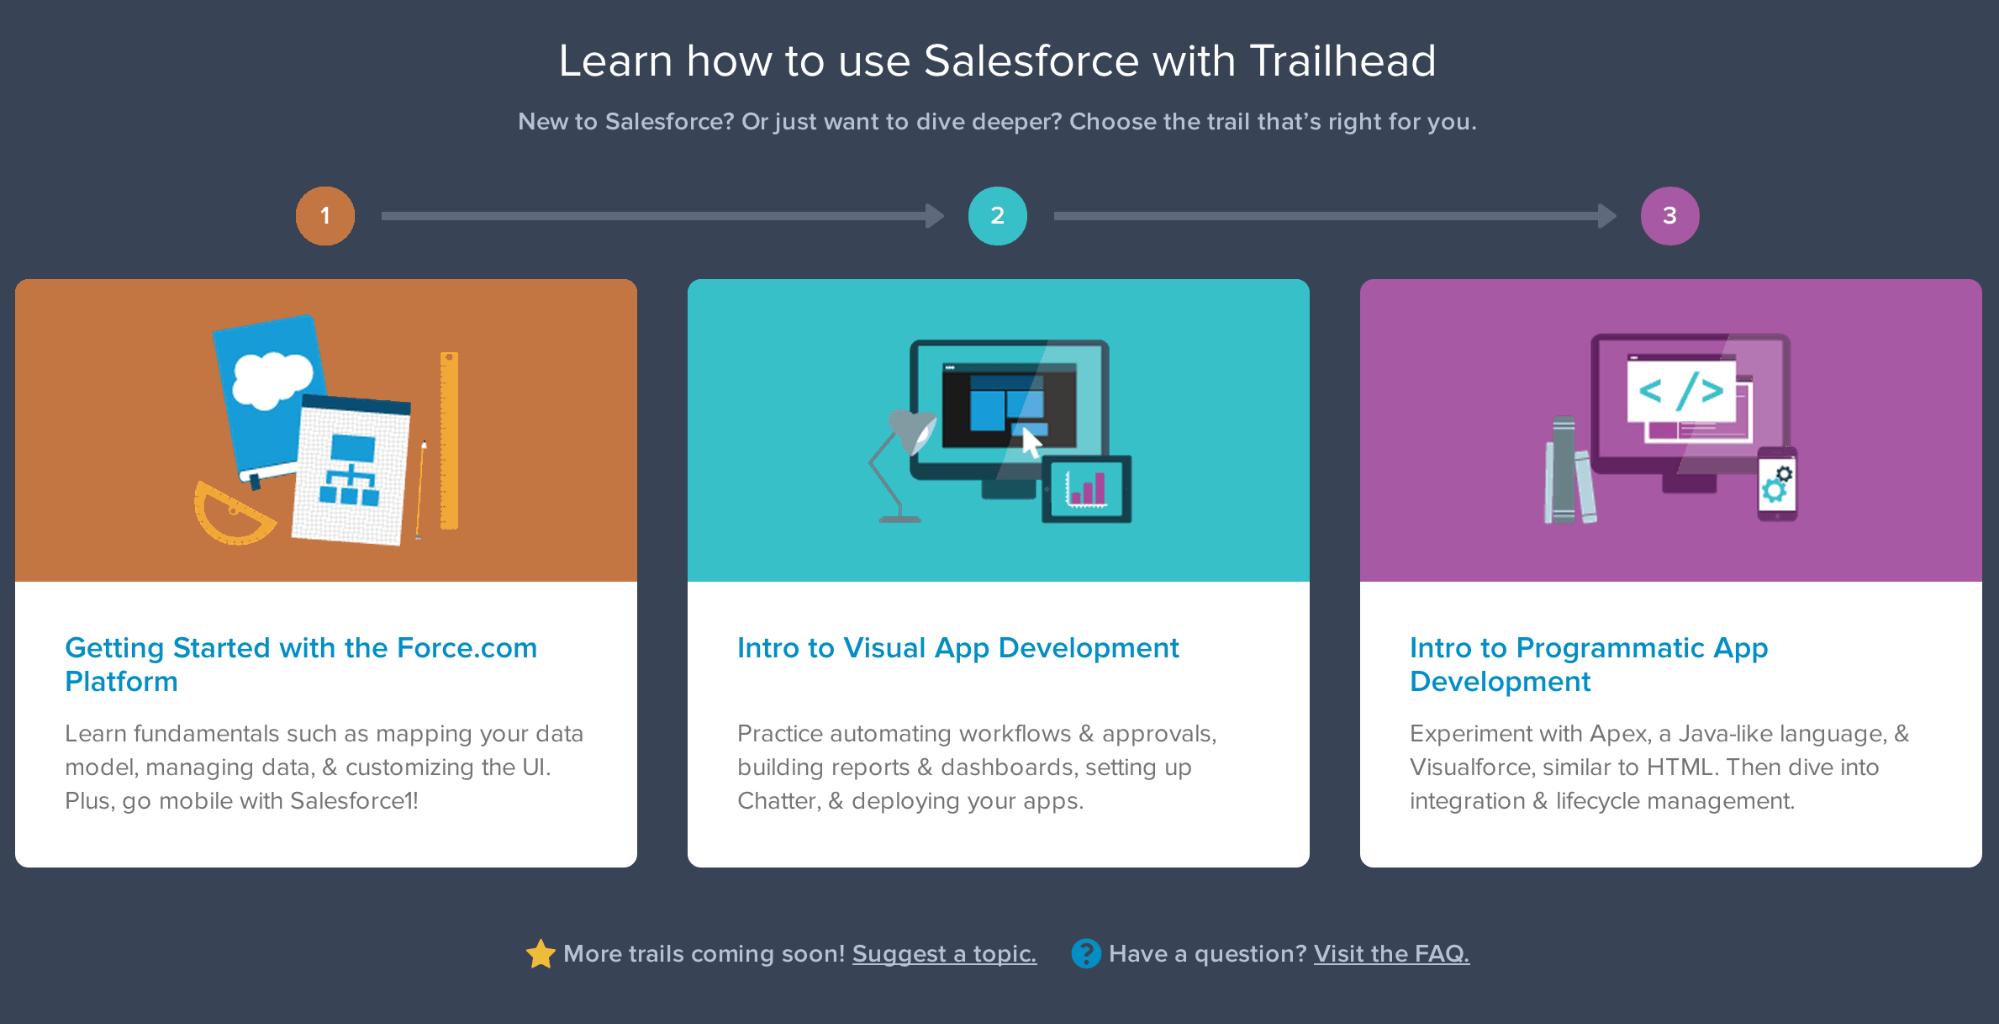 salesforce-trailhead-illustration